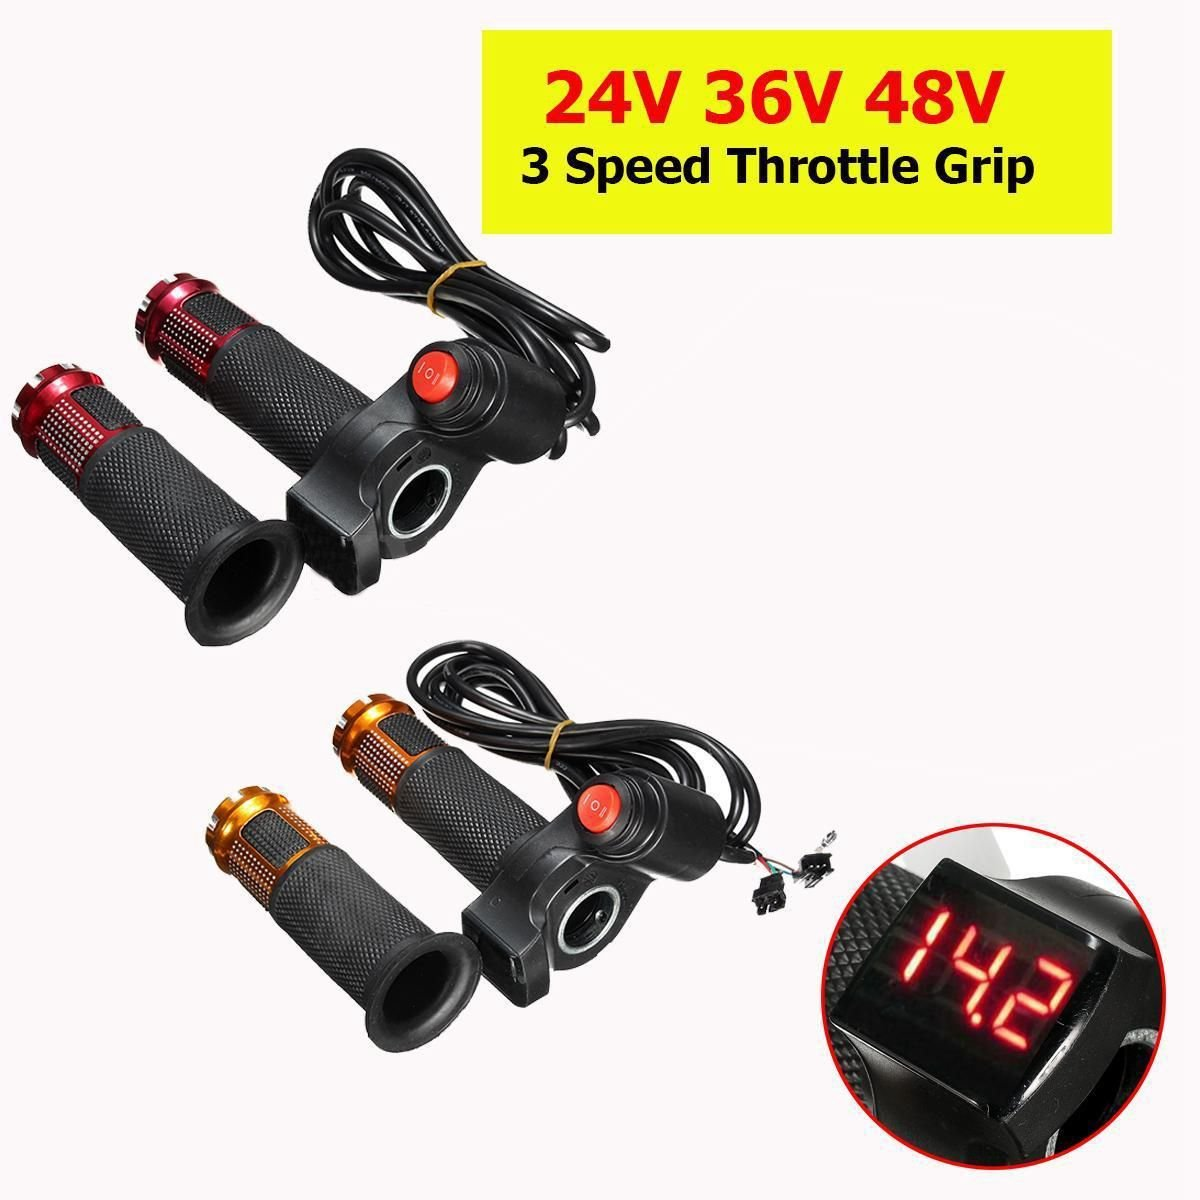 Rollschuhe, Skateboards Und Roller 24 V 36 V 48 V 3 Geschwindigkeit Elektrische Roller Gas Grip Lenker Led Digital Meter